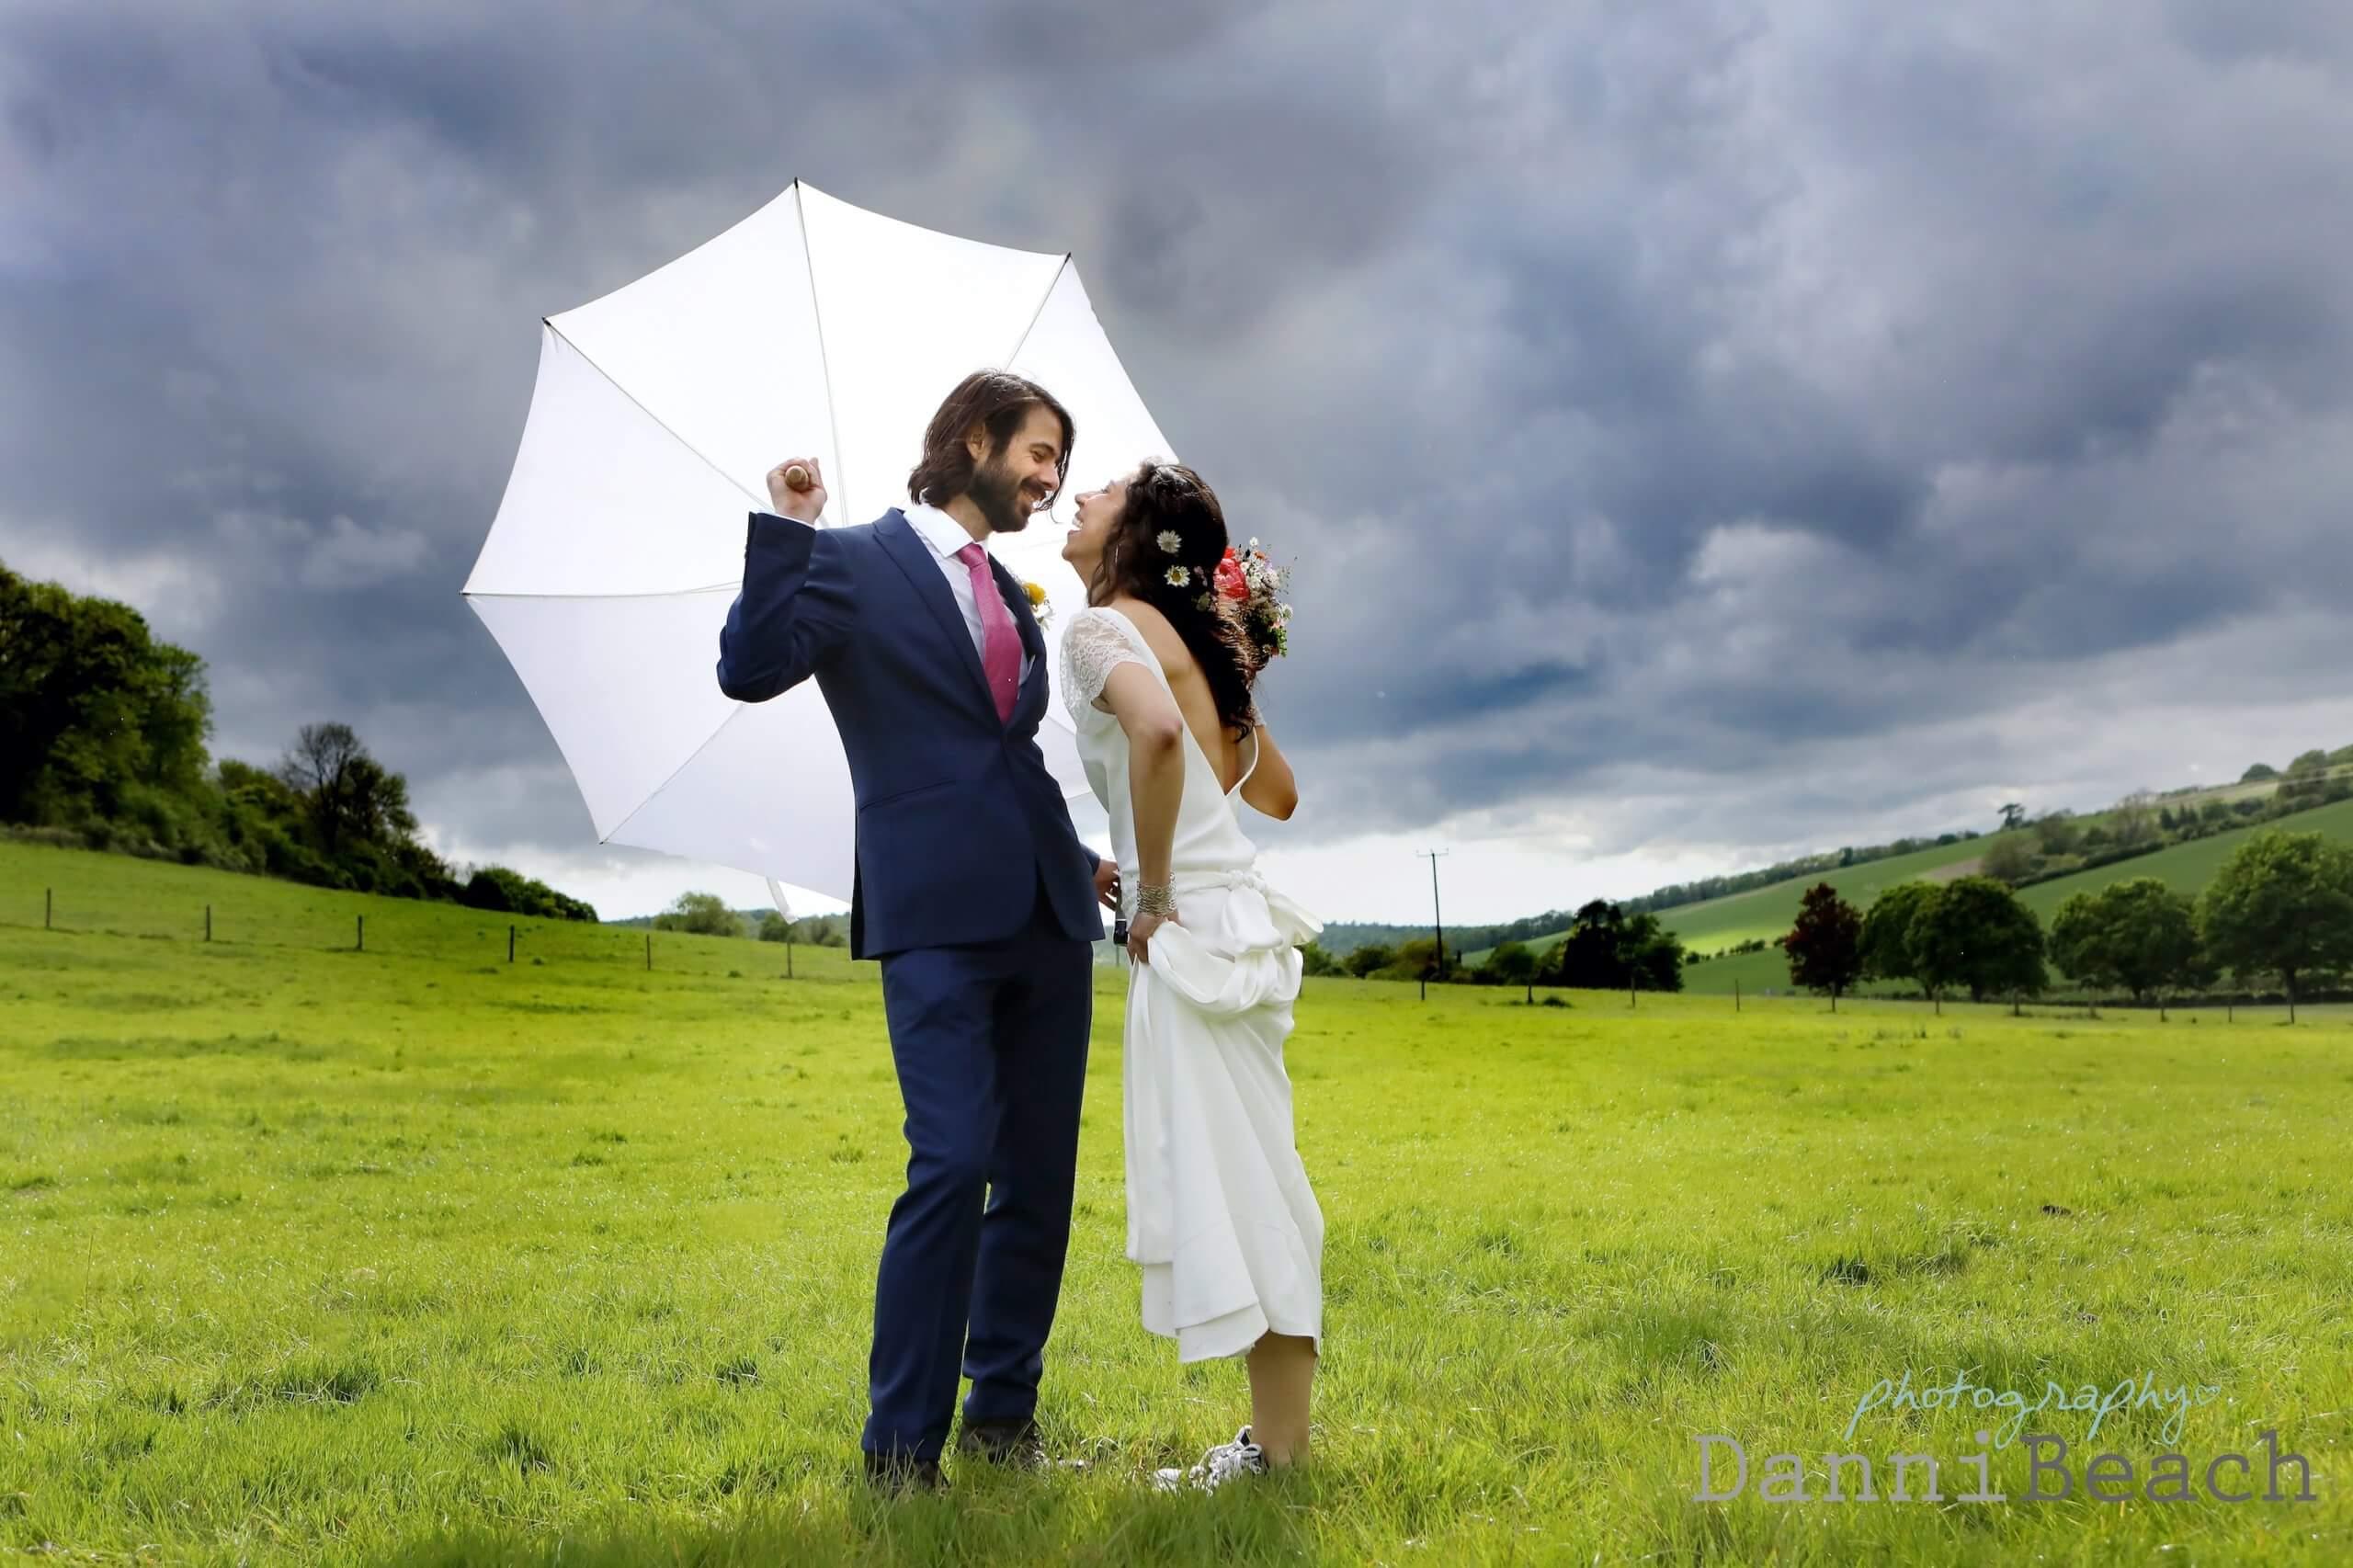 Umbrella on your wedding day